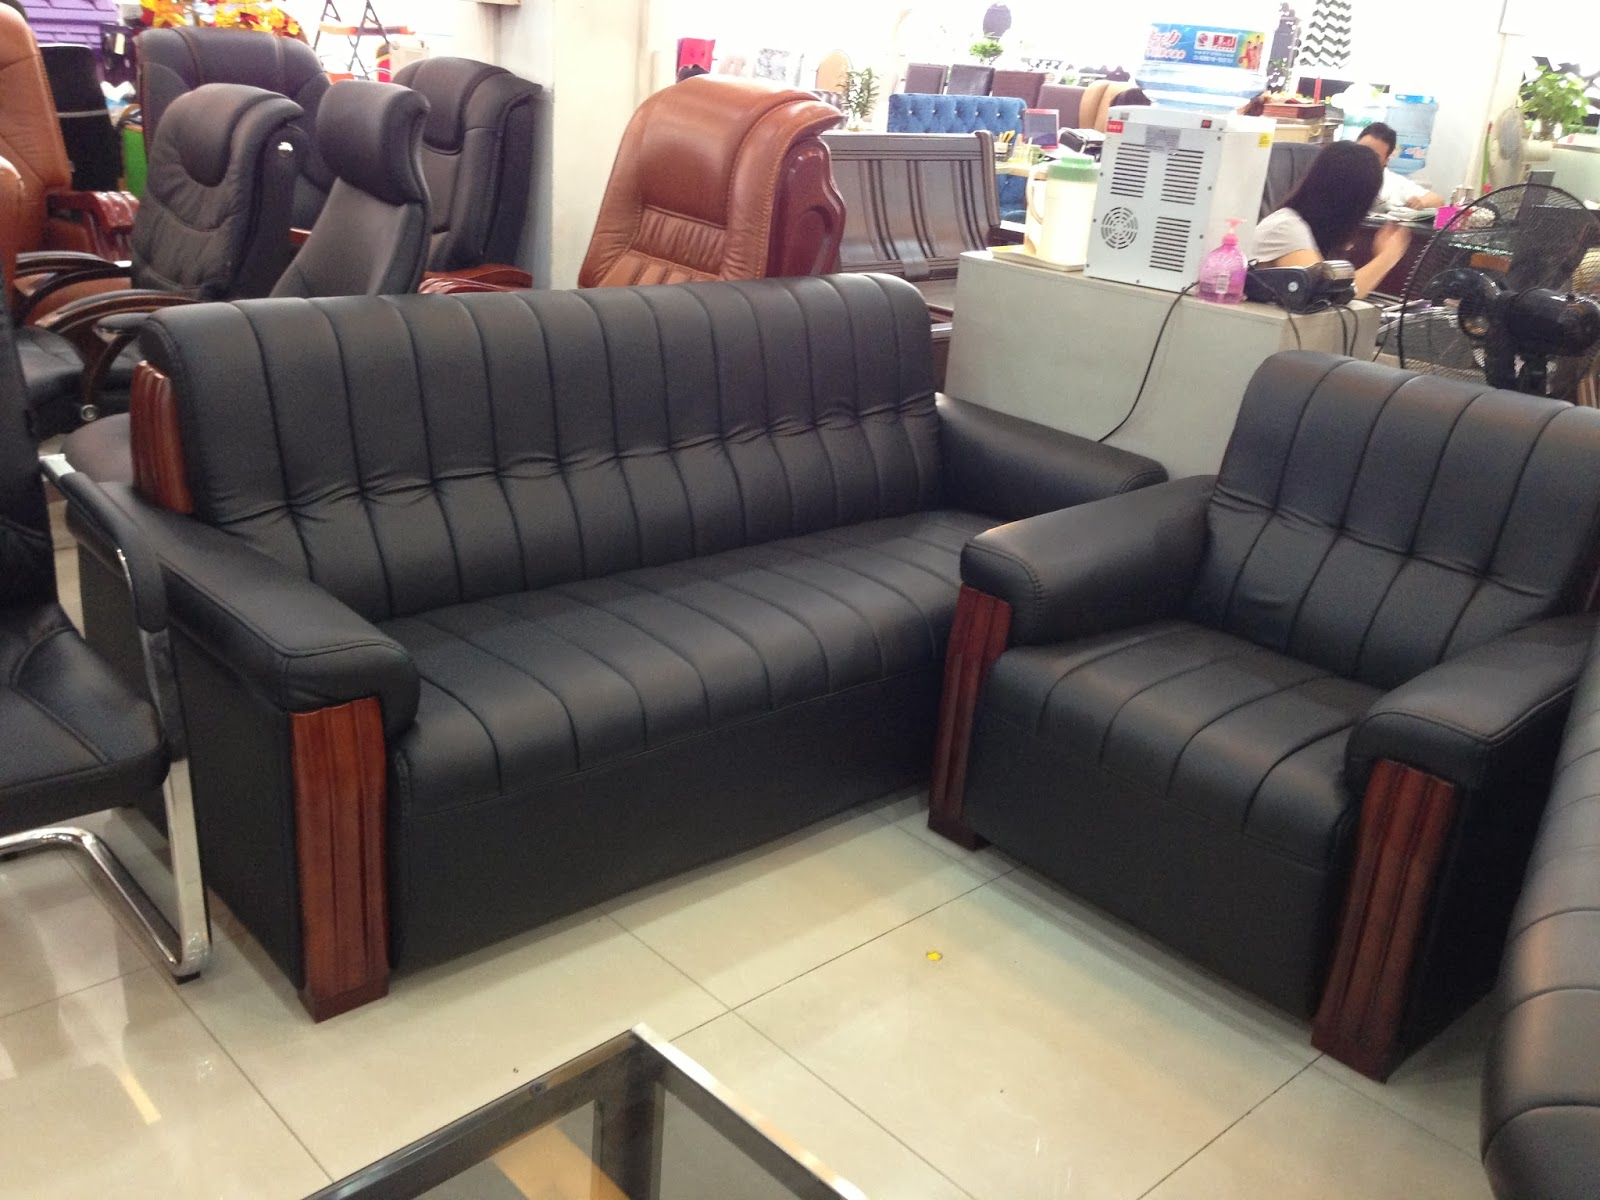 New Style Of Sofa Set Lovesac Bean Bag 2014 Furniture Design